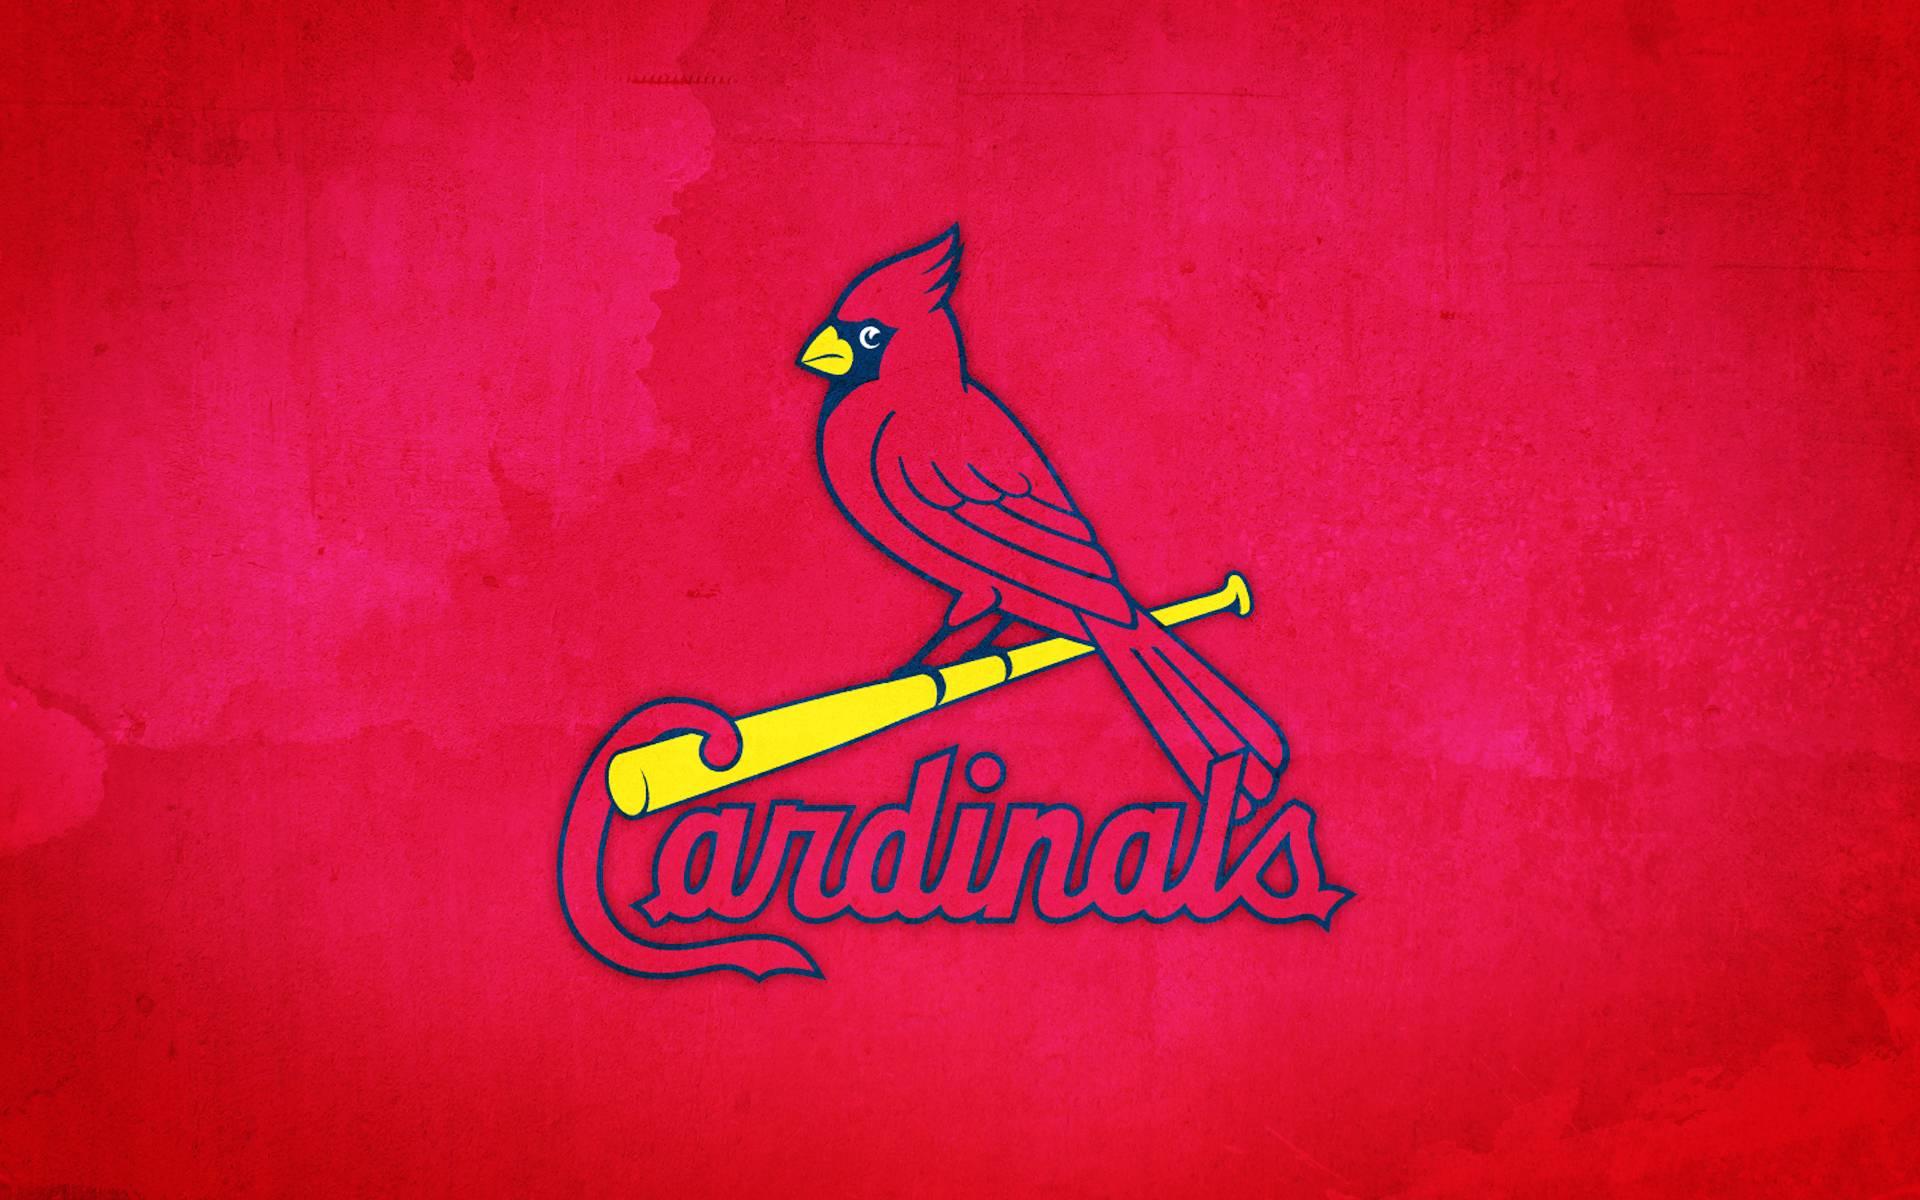 cardinals wallpaper - photo #7